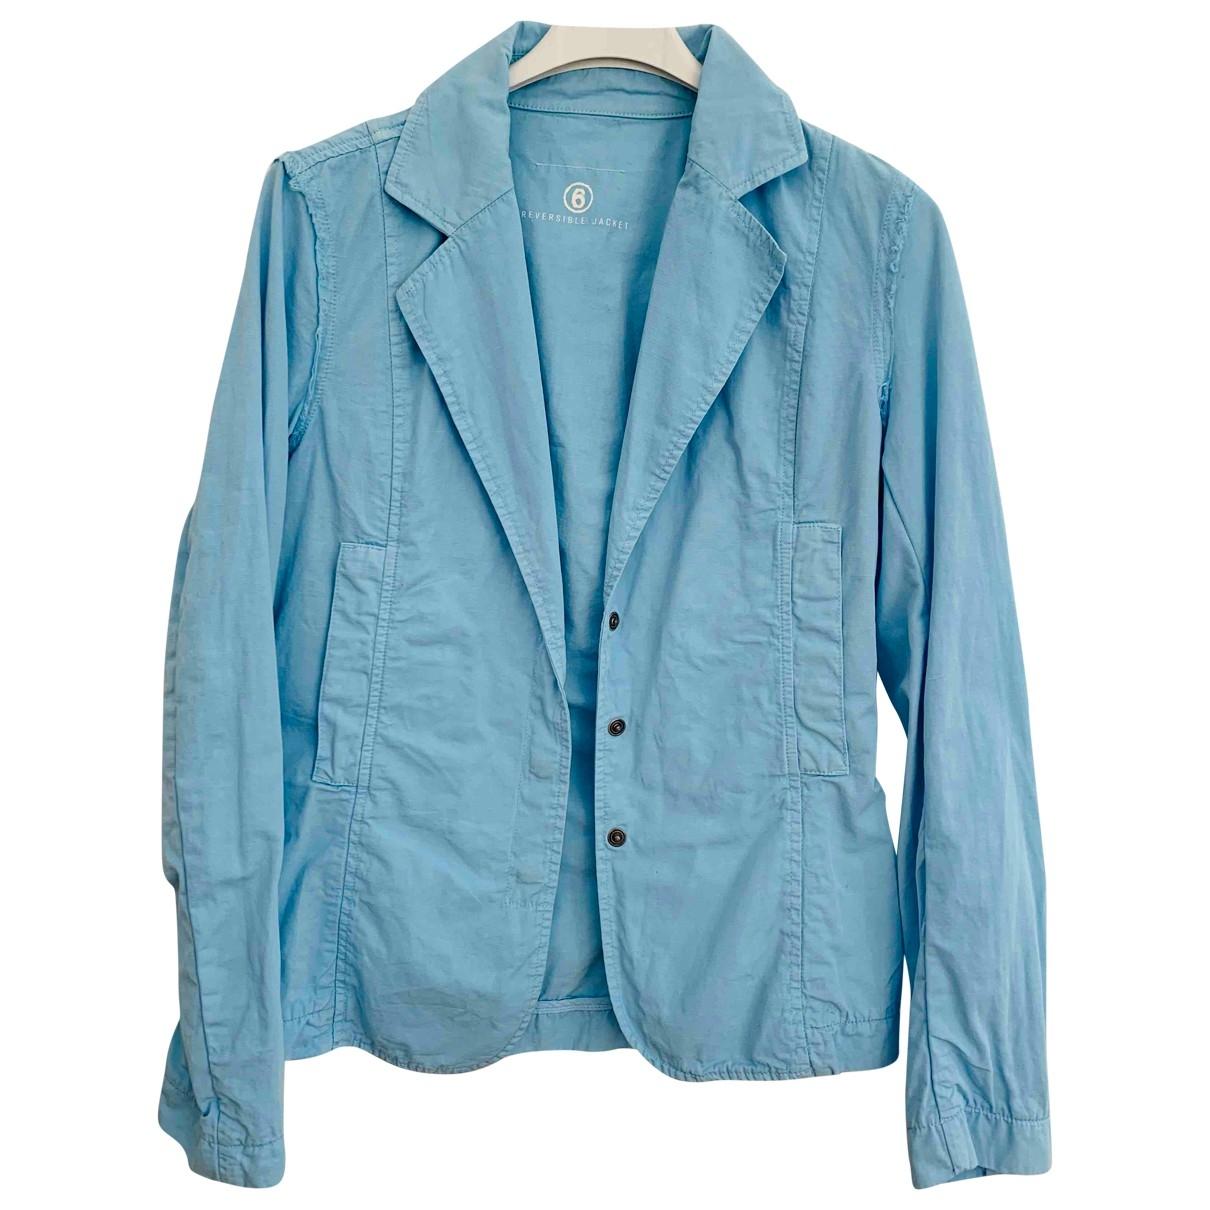 Mm6 \N Blue Cotton jacket for Women 36 FR